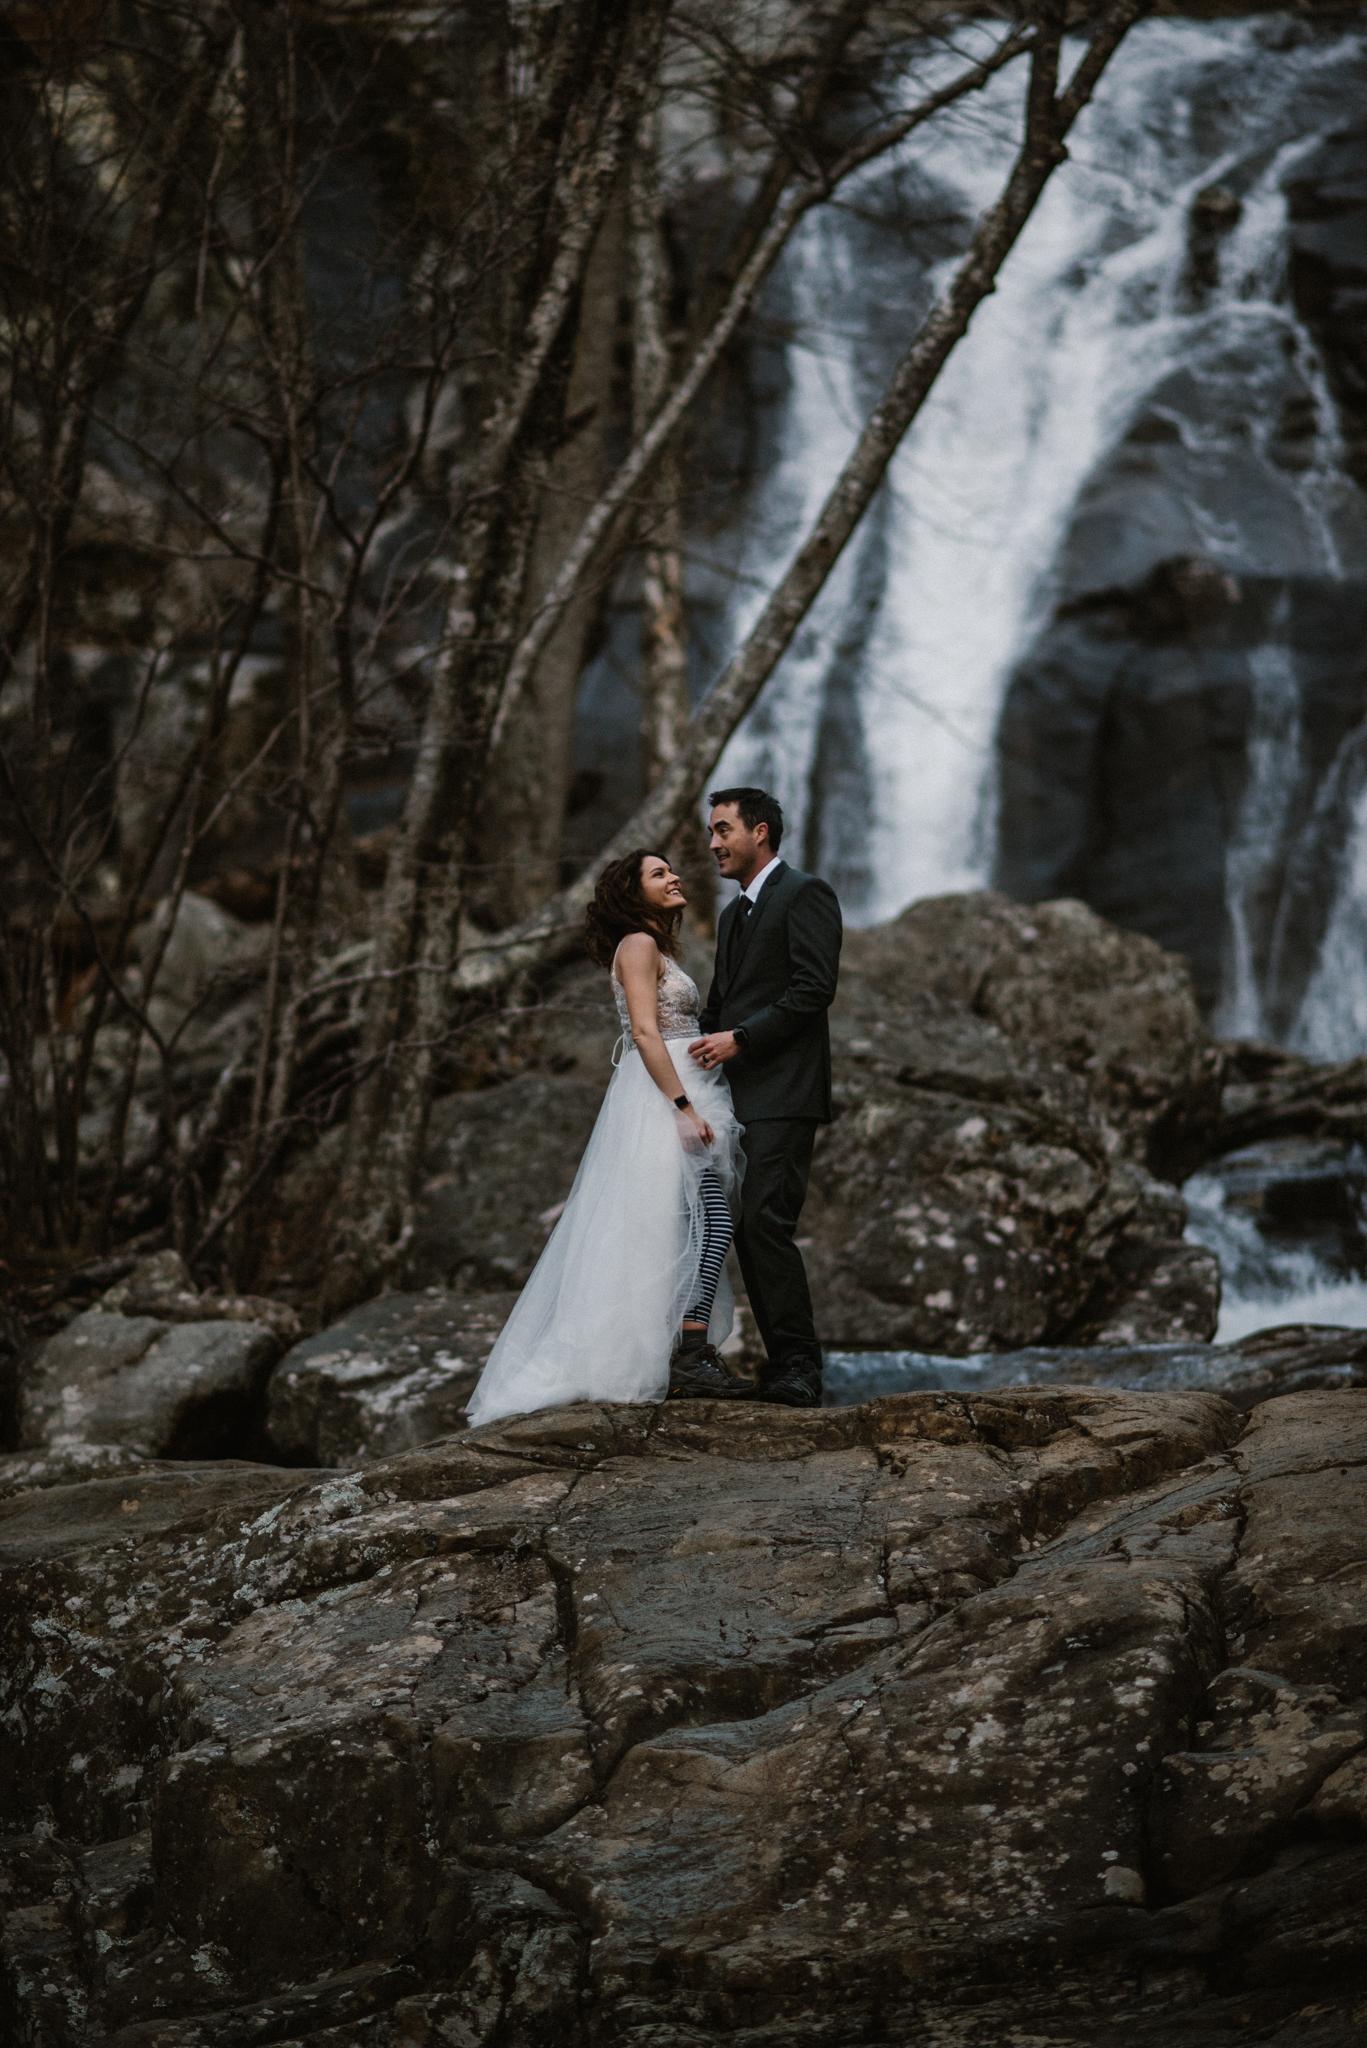 Stephanie and Steve - Shenandoah National Park Elopement - Sunrise Hiking Elopement - Adventurous Elopement - Virginia Elopement Photographer - Shenandoah national Park Wedding Photographer - White Sails Creative_11.jpg